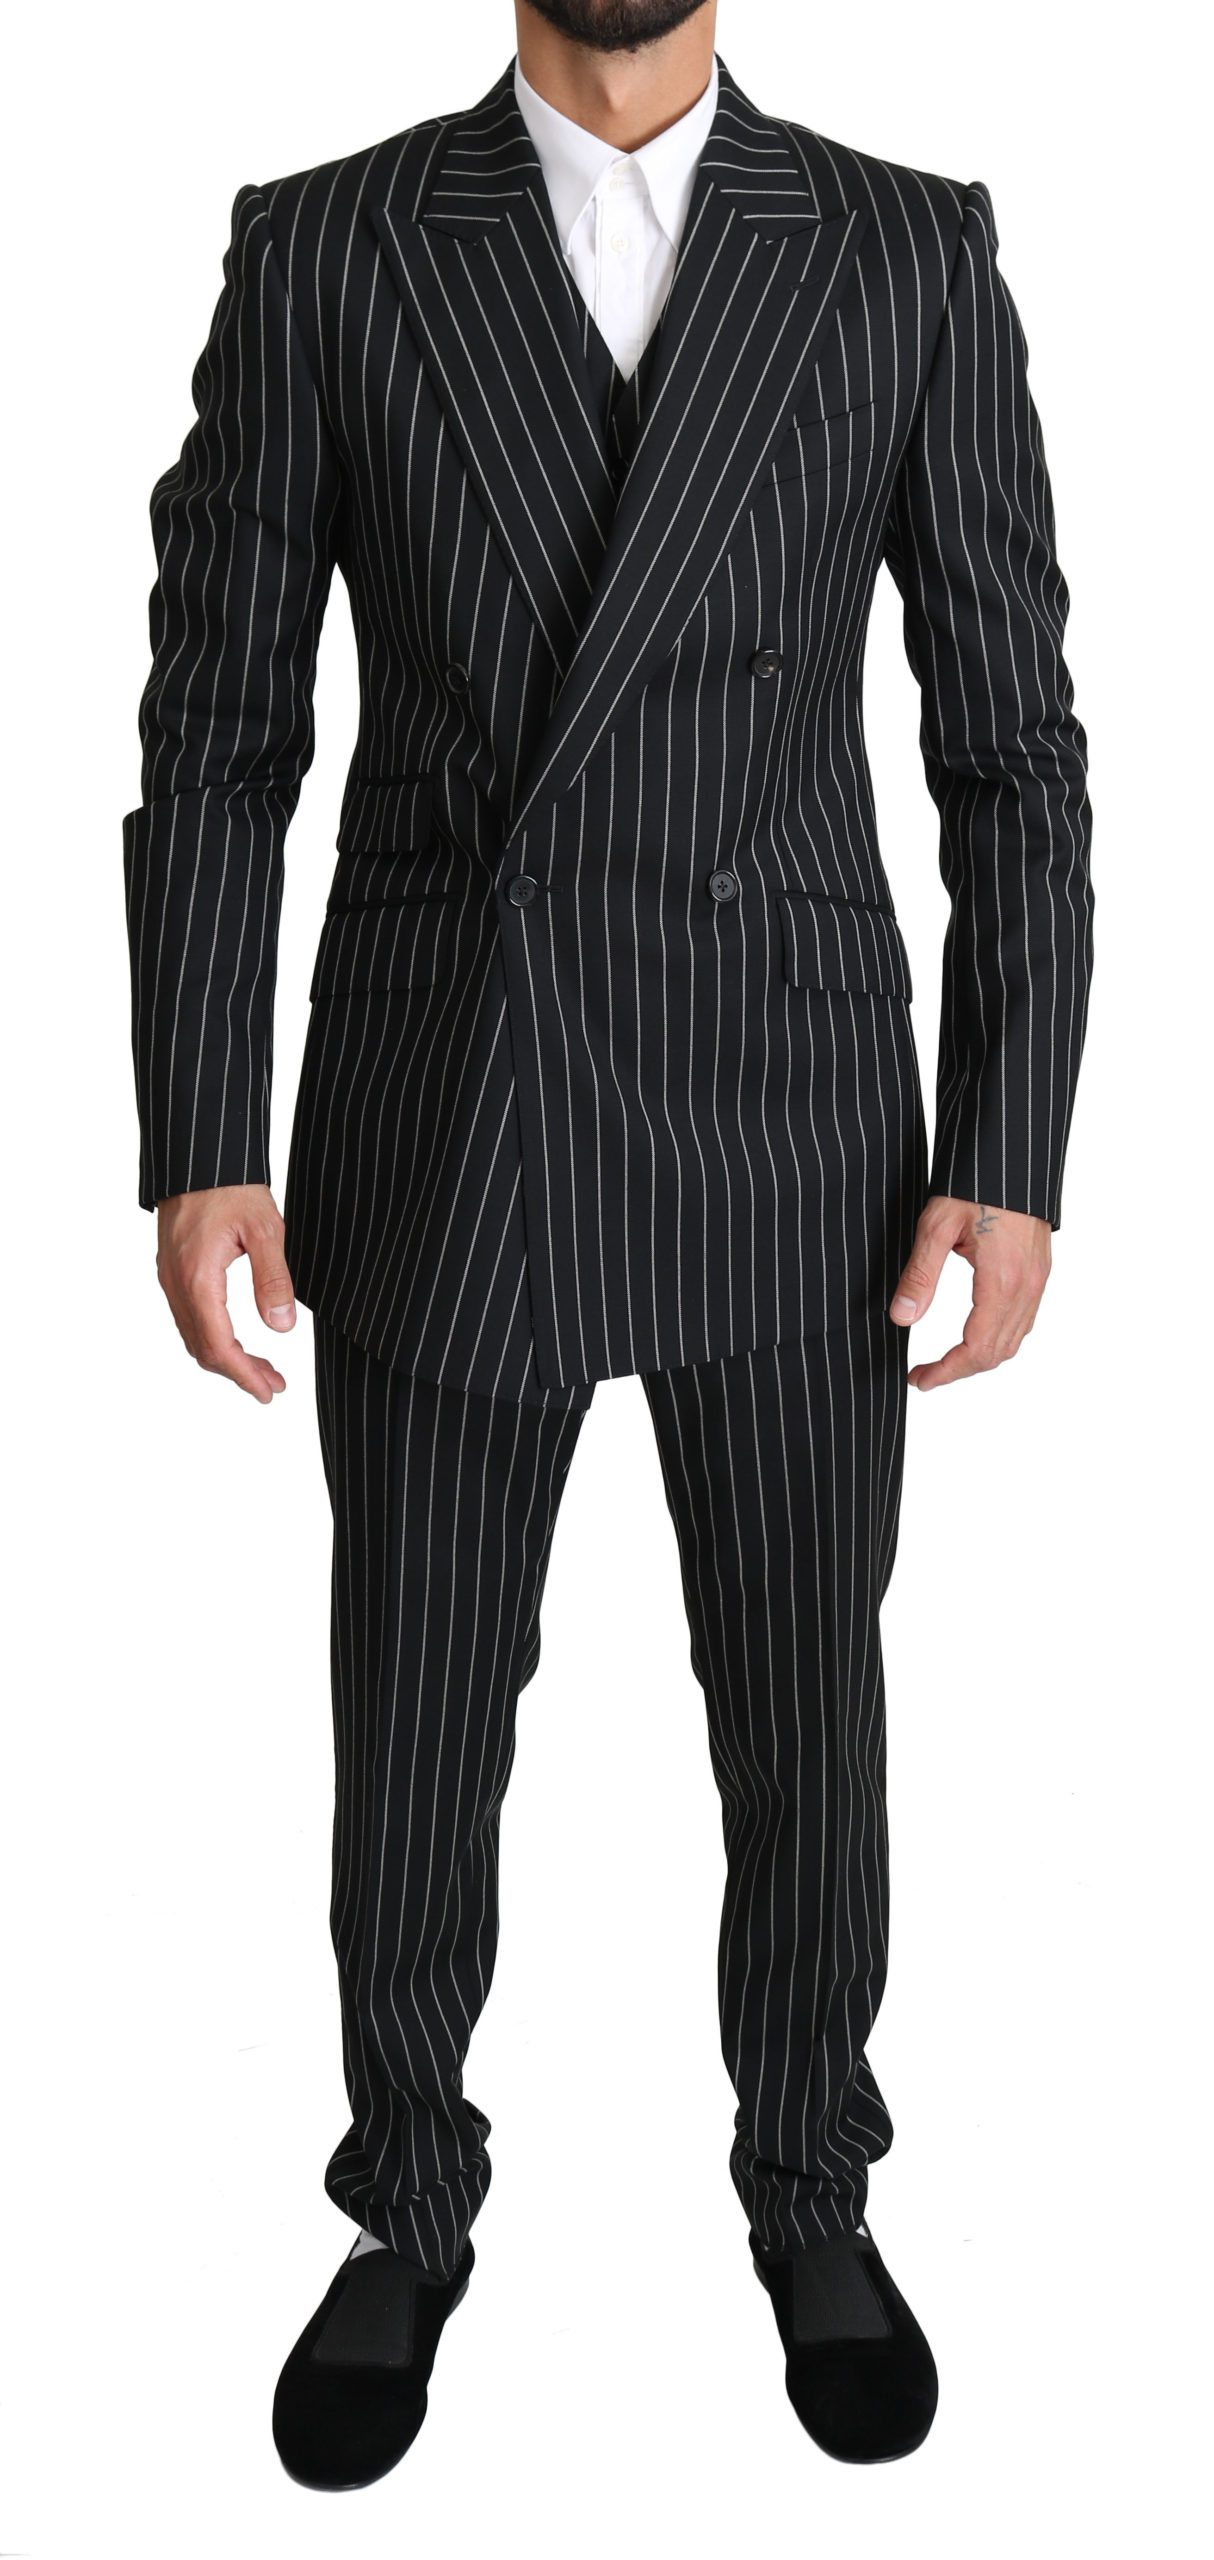 Dolce & Gabbana Men's Striped 3 Piece SICILIA Suit Beige KOS1525 - IT48   M